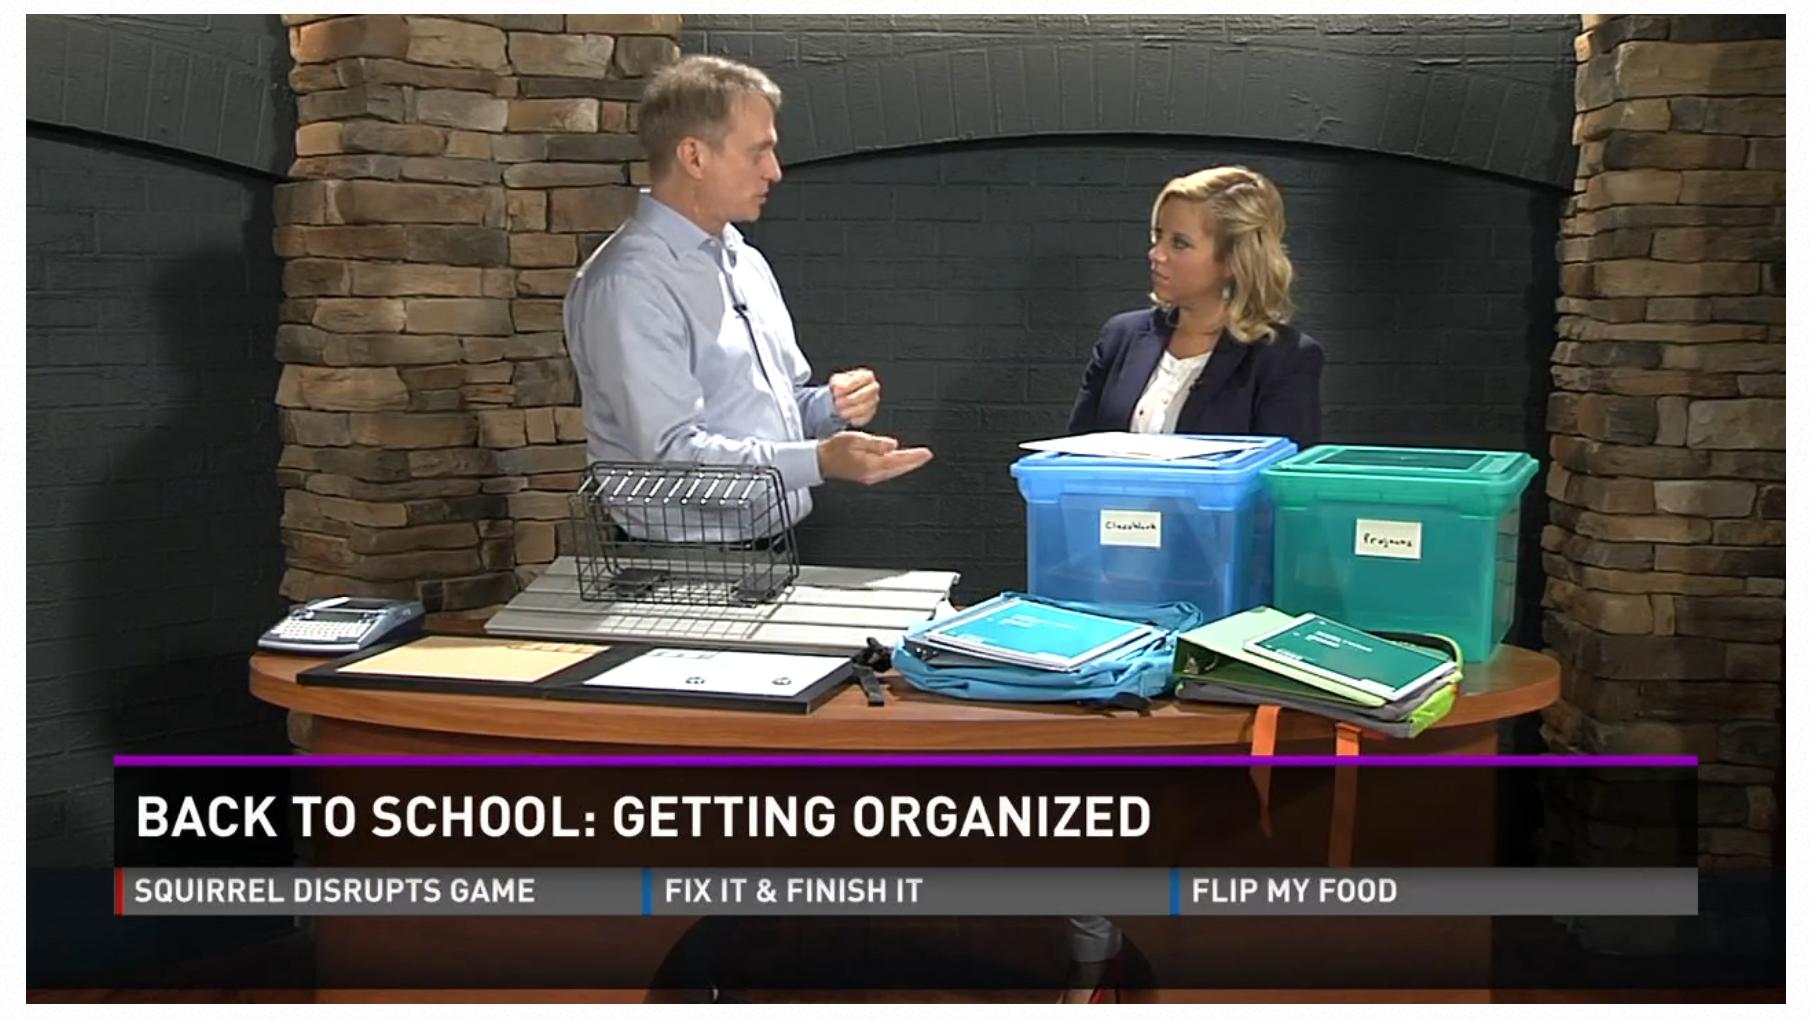 Back to School: Getting Organized